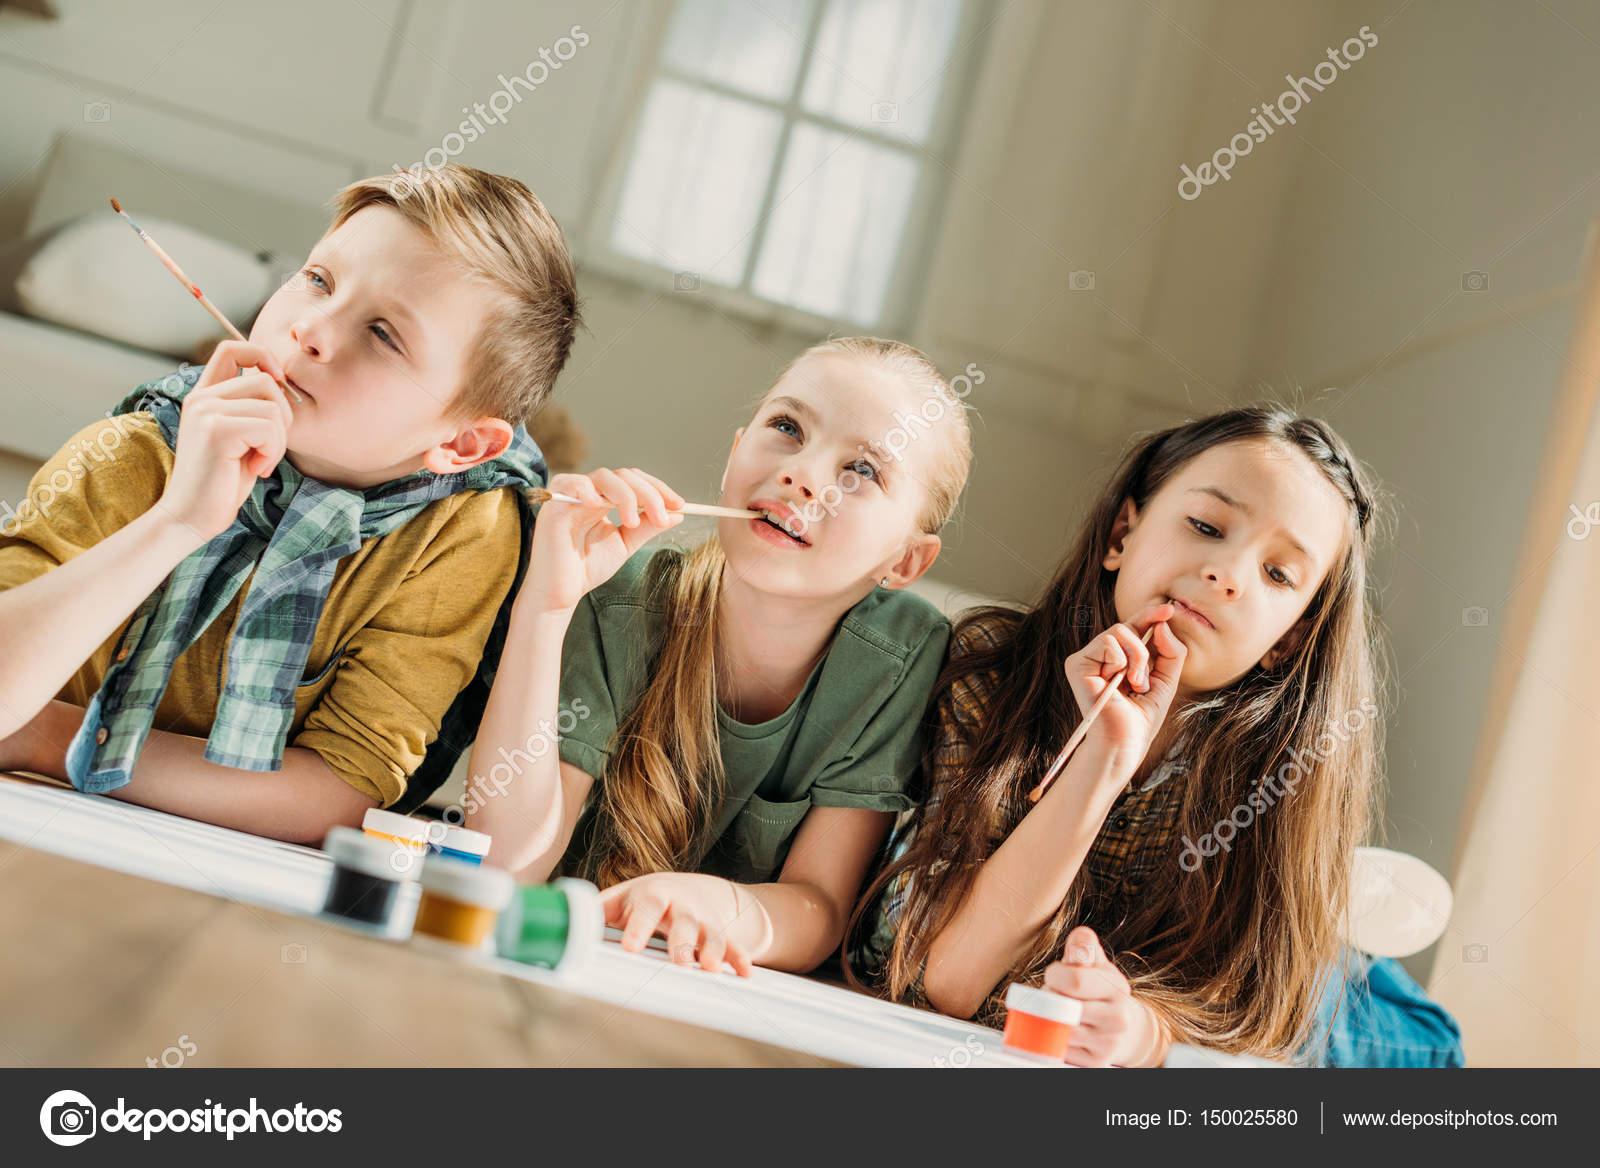 2fcdf1968c5 χαριτωμένα παιδιά ζωγραφική — Φωτογραφία Αρχείου ...